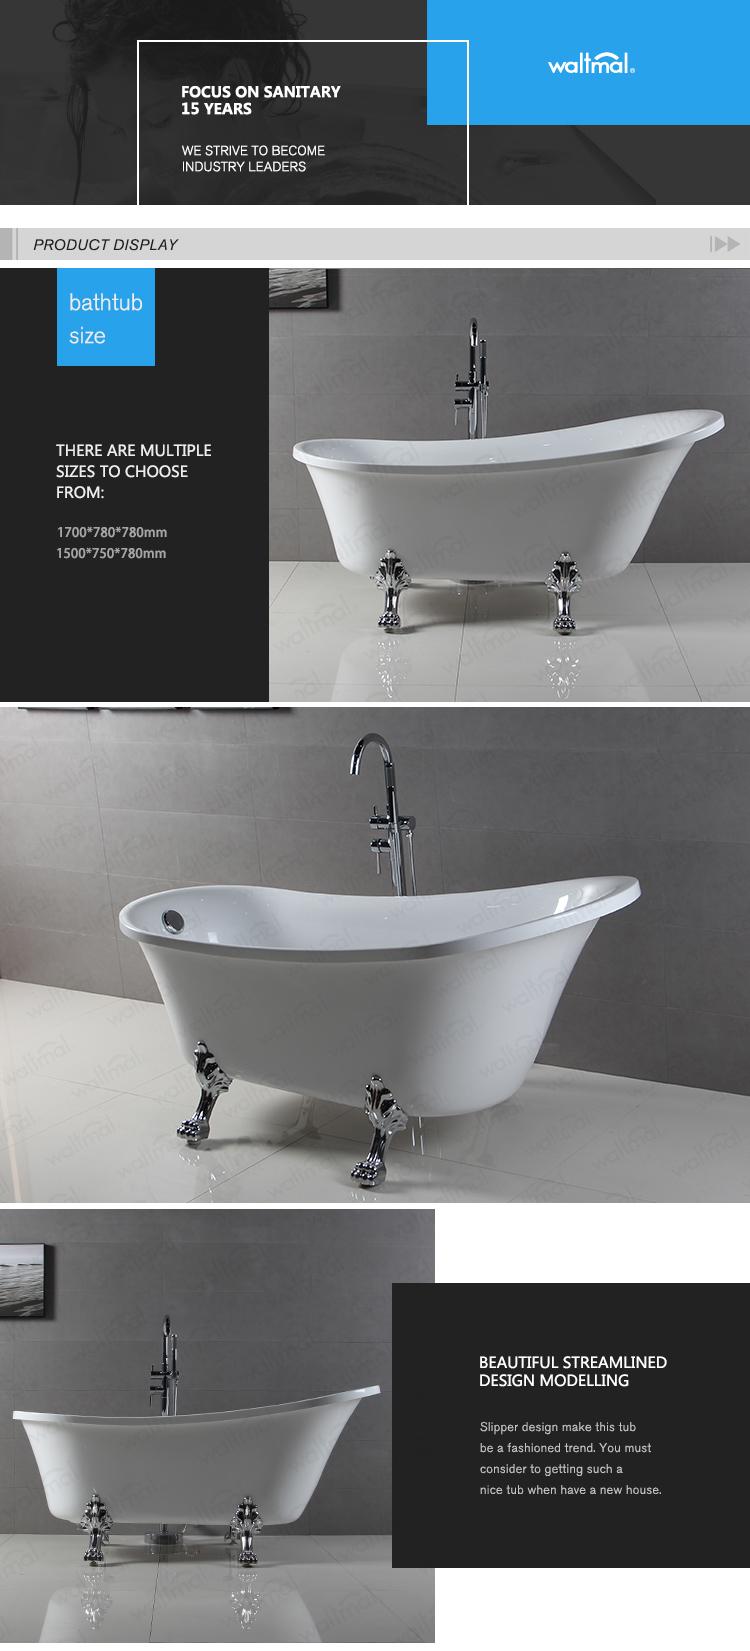 Classical Bathroom Free Standing Acrylic Clawfoot Bath Tub With ...